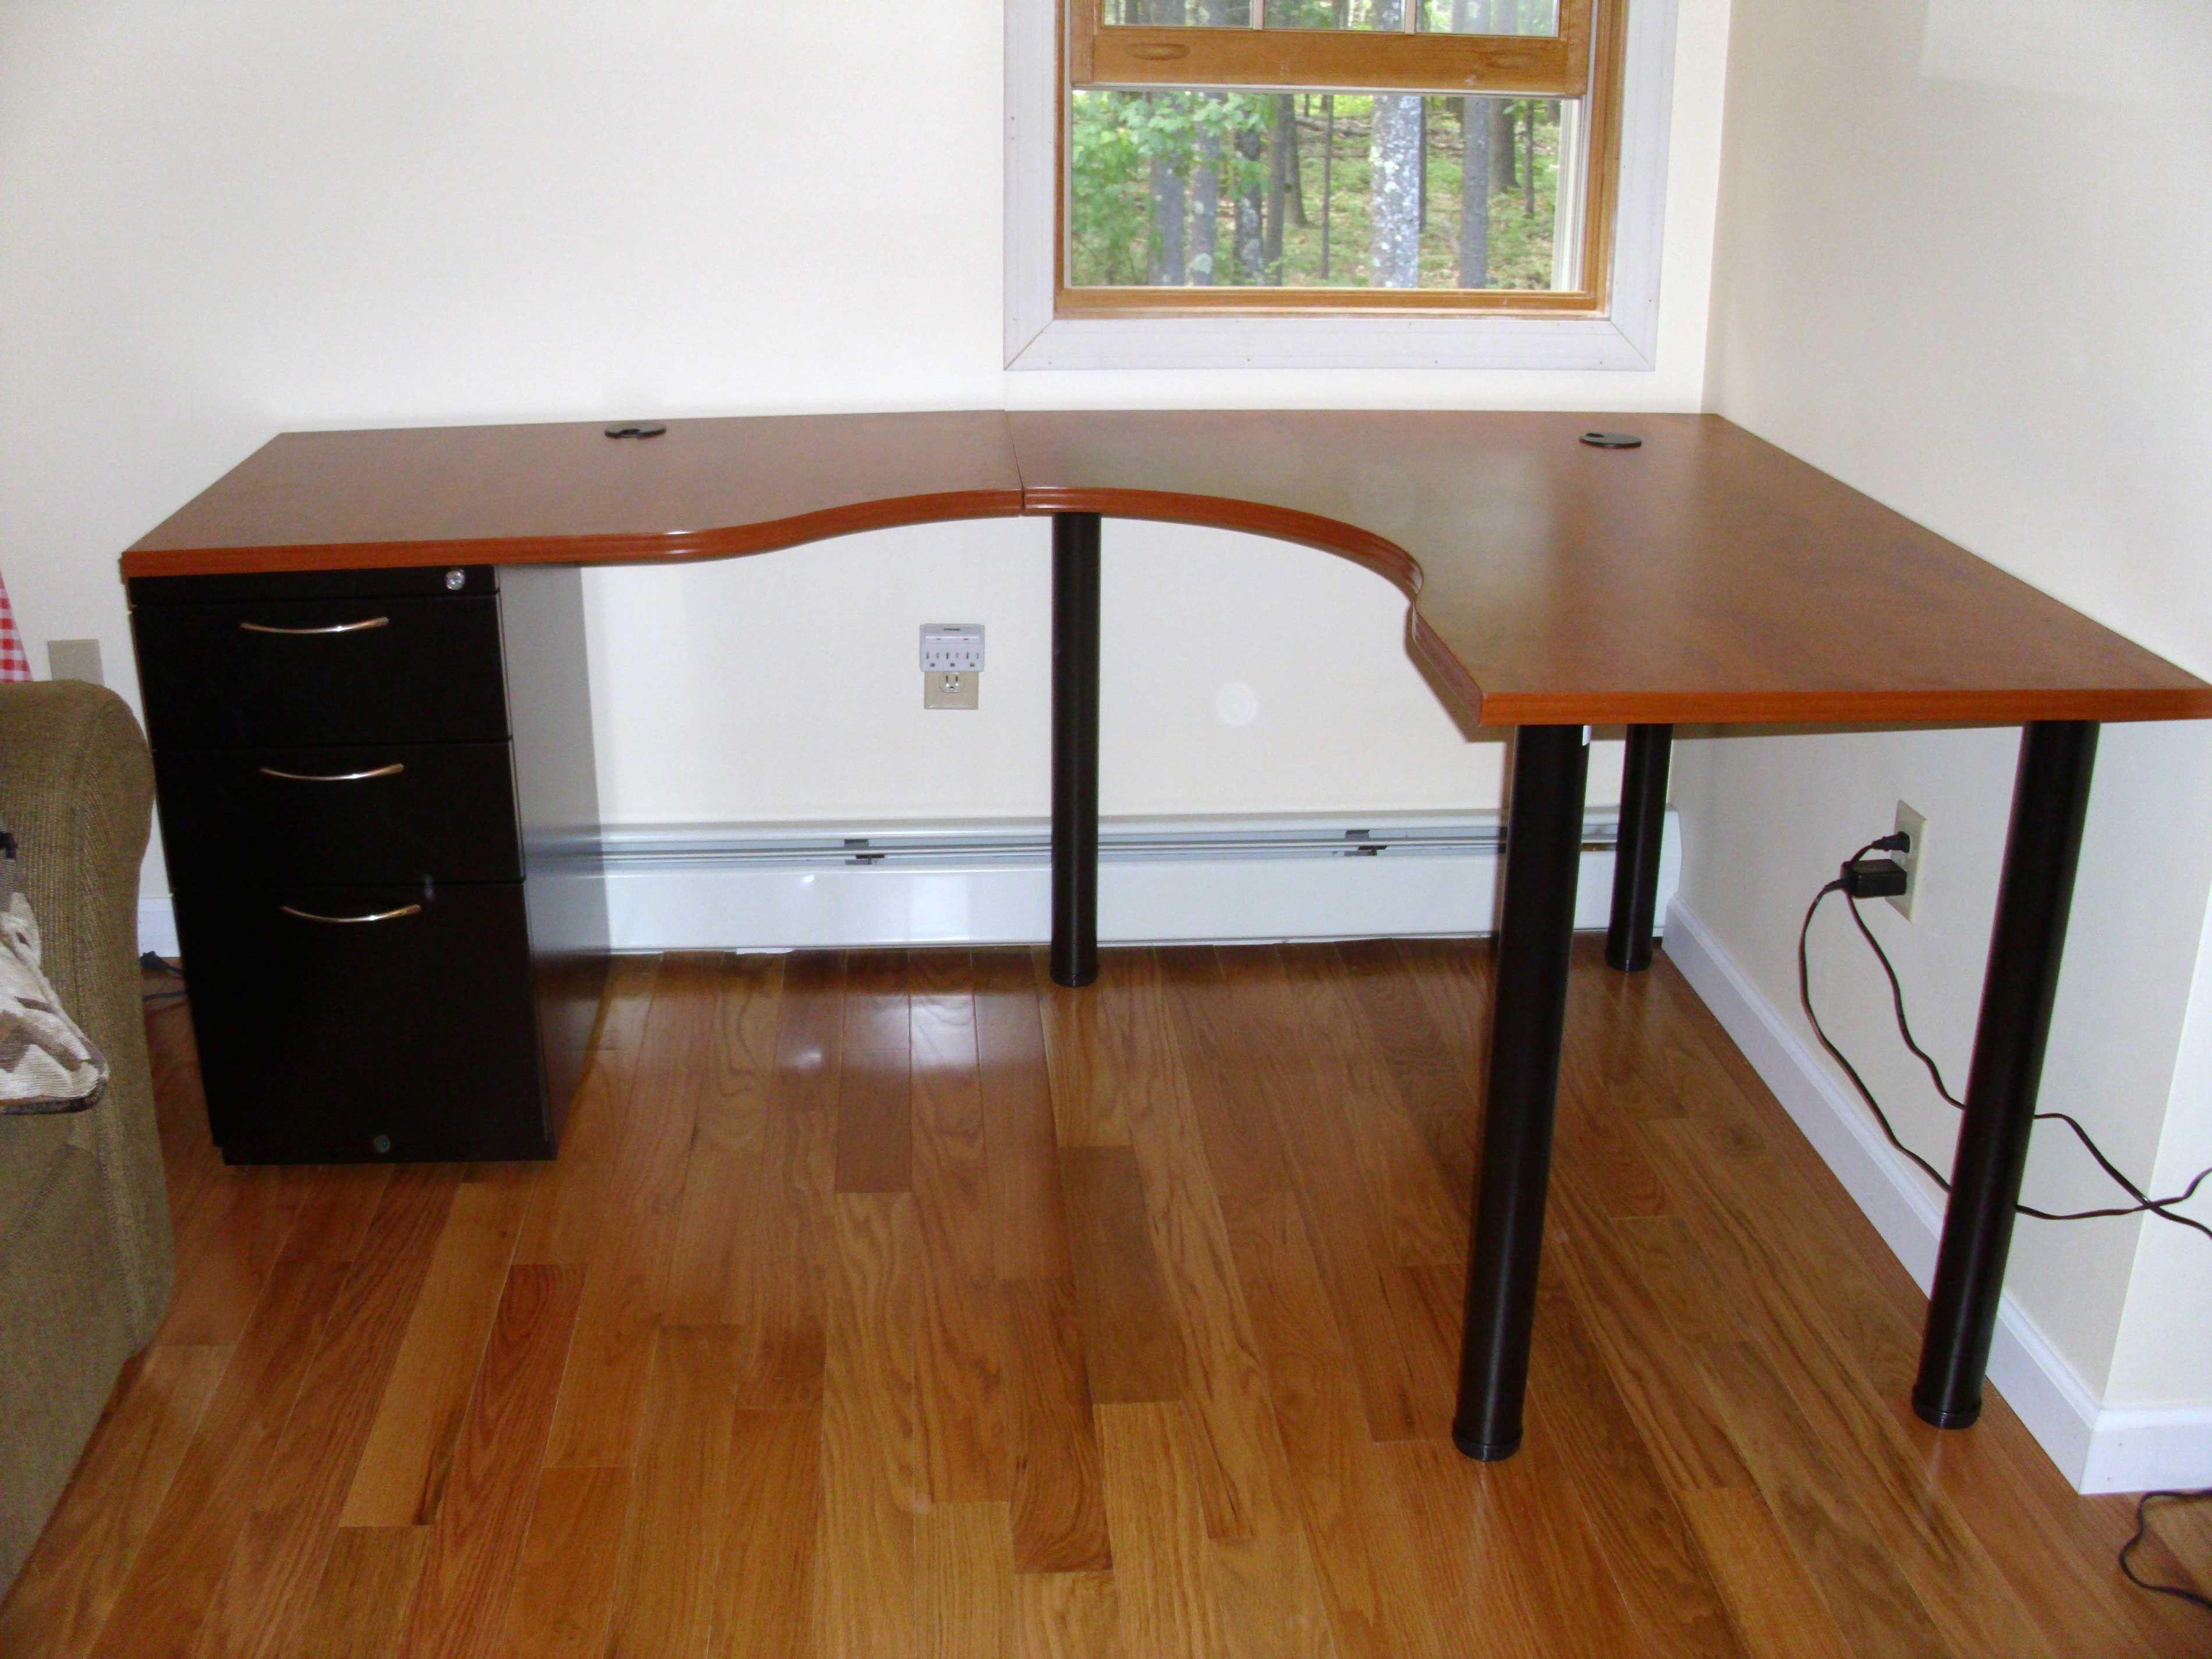 pin by interior design y on office desks pinterest desk rh pinterest com